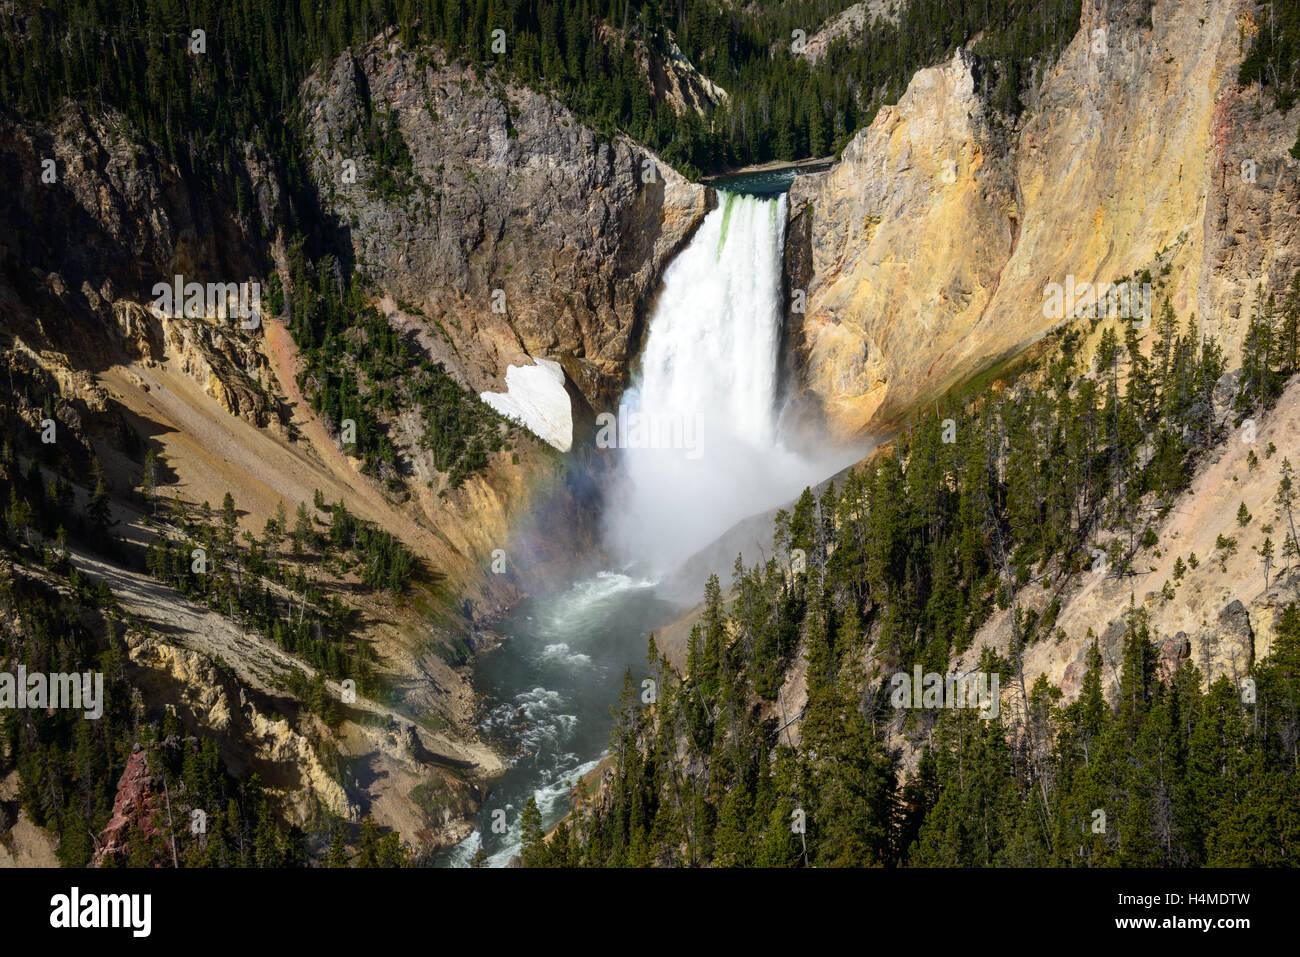 Yellowstone National Park - Stock Image